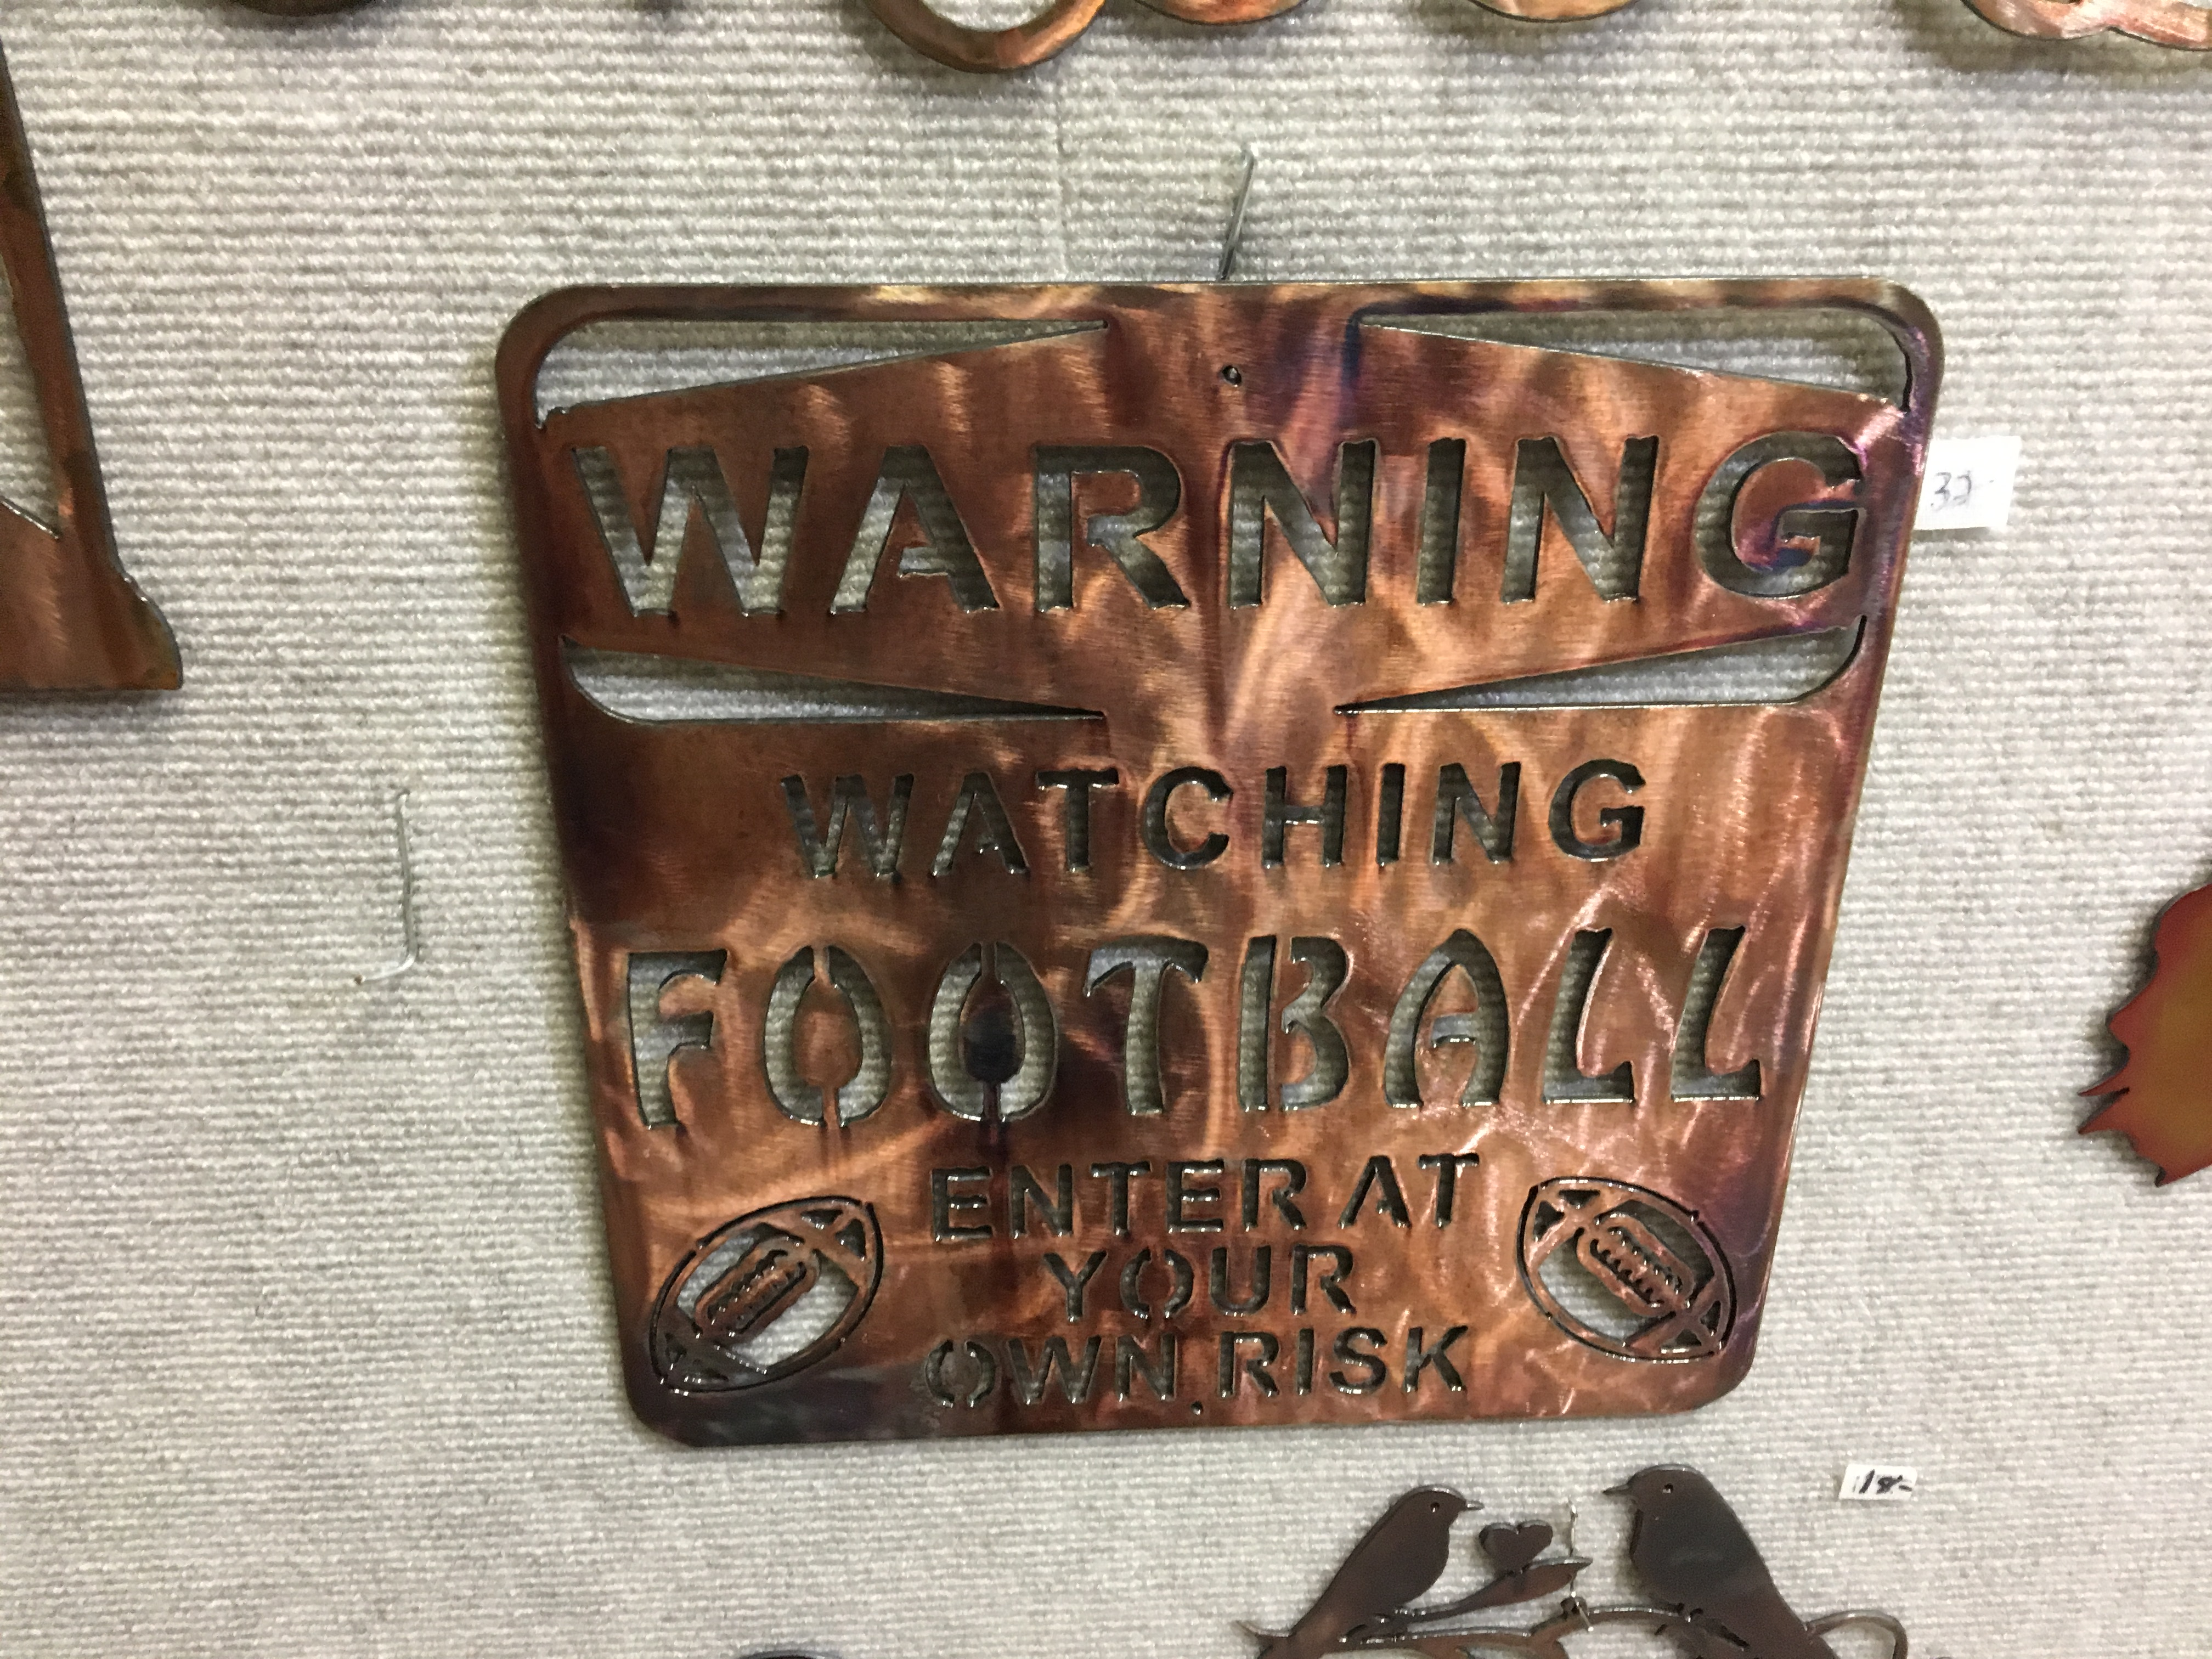 Warning - Watching Football